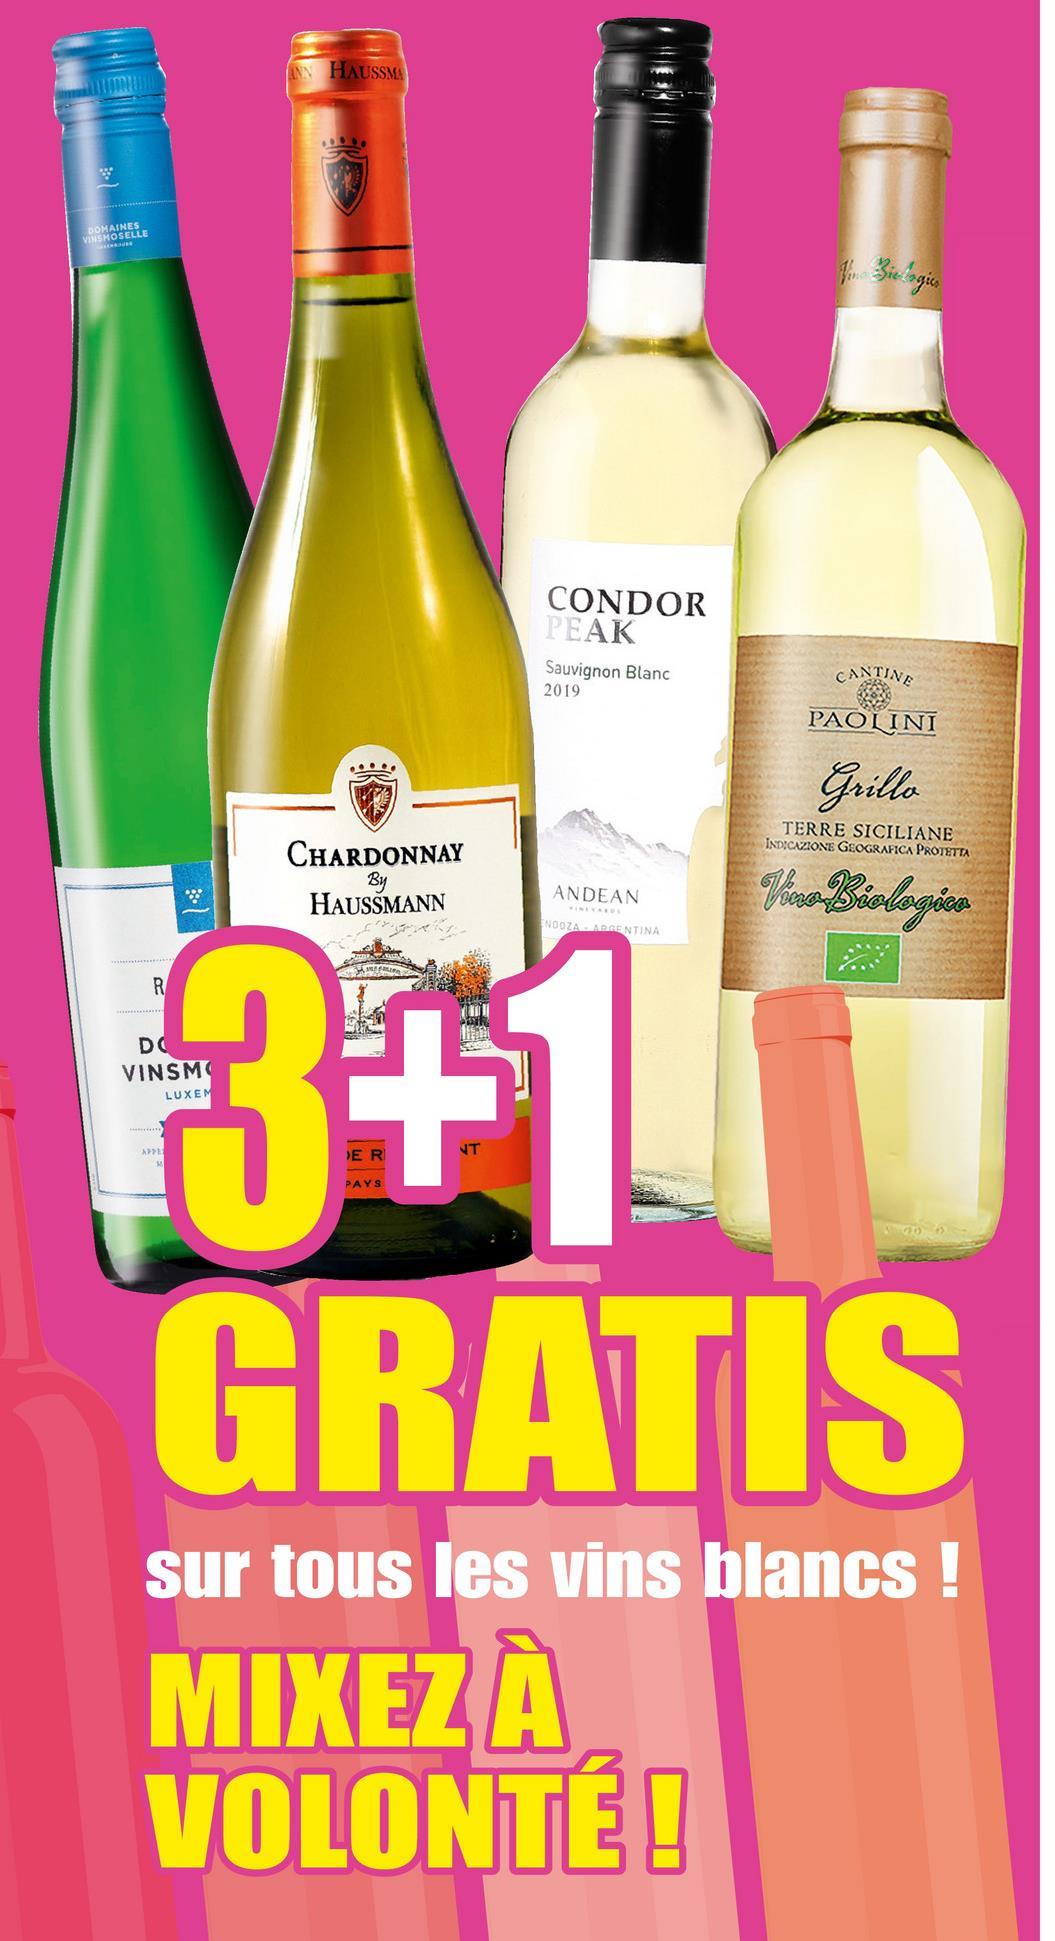 ANN HAUSSMA DOMAINES VINSMOSELLE Biologico CONDOR PEAK Sauvignon Blanc 2019 CANTINE PAOLINI Grillo TERRE SICILIANE INDICAZIONE GEOGRAFICA PROTETTA CHARDONNAY By HAUSSMANN ANDEAN Viro Biologica NDOZA RENTINA R DC VINSMO LUXEM + >> 3+1 GRATIS sur tous les vins blancs ! MIXEZ À VOLONTÉ!